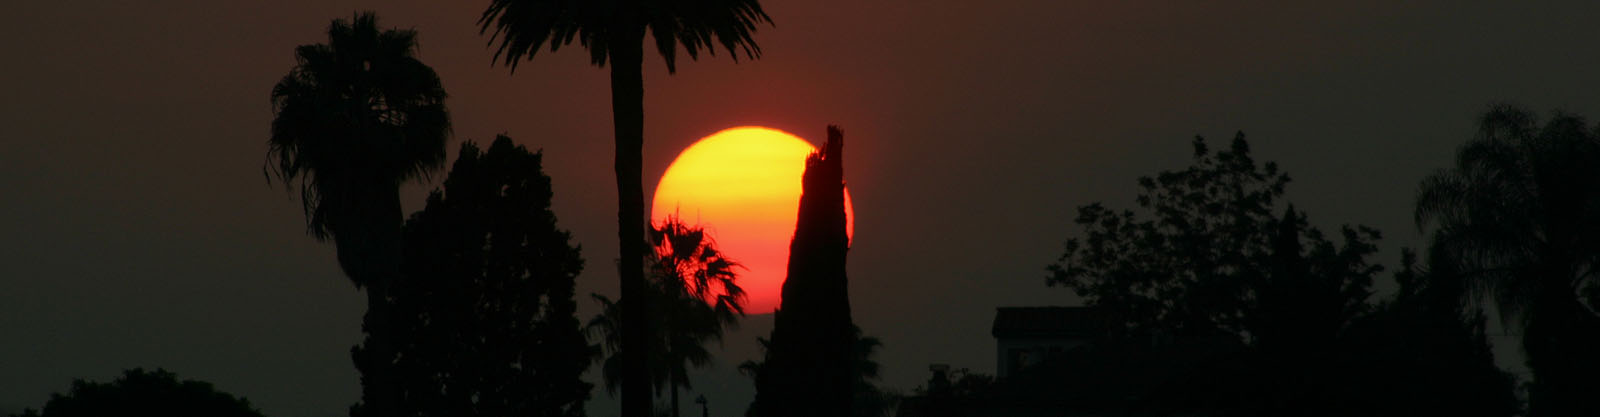 sunset0730.jpg